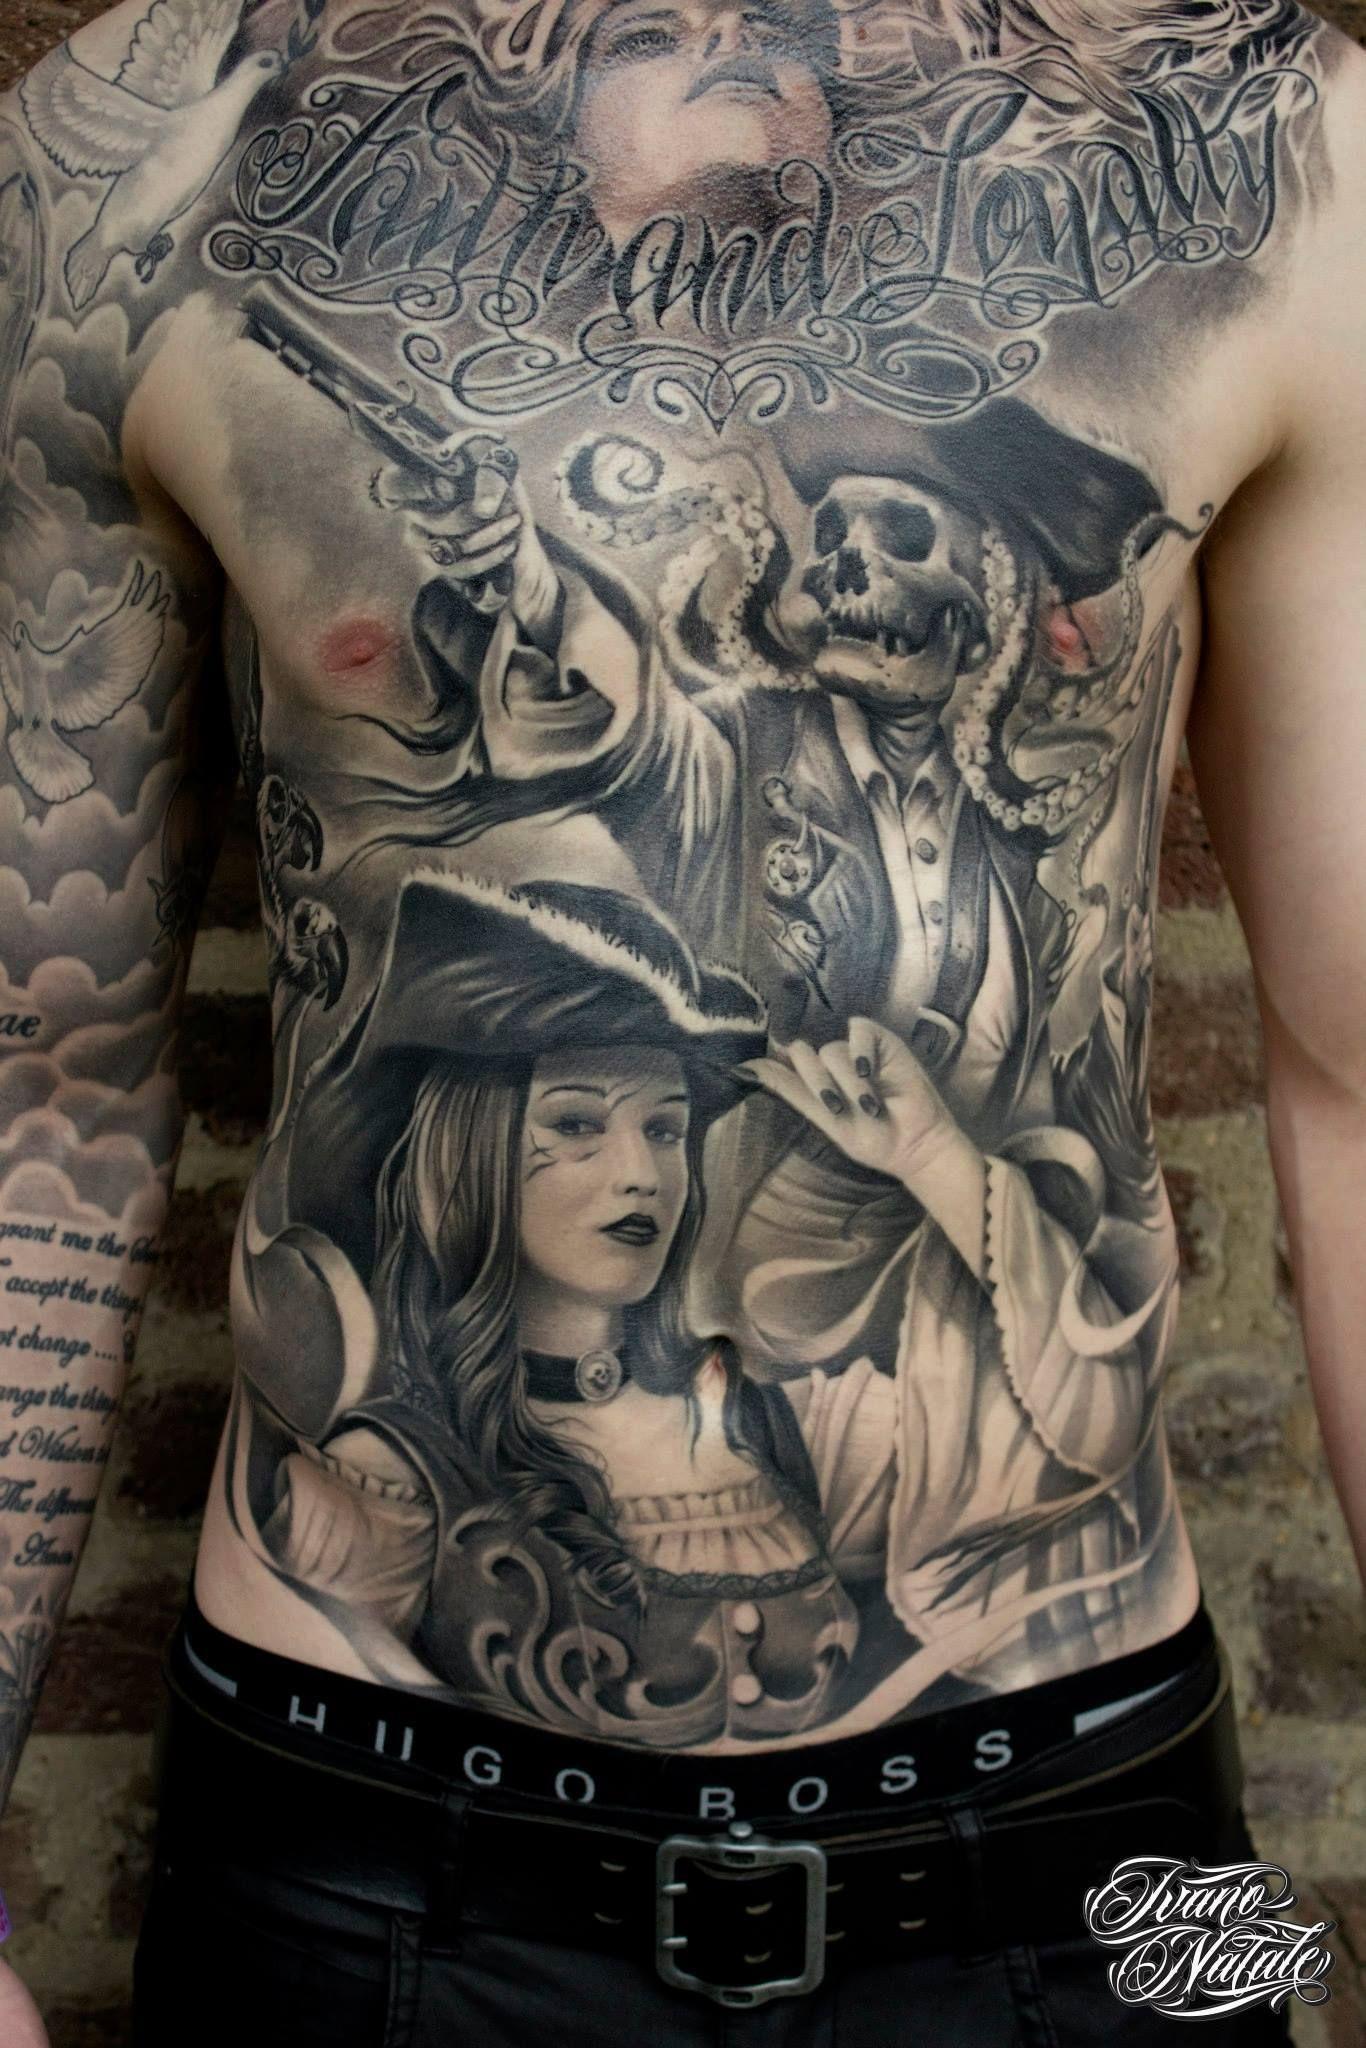 Amazing Tattoo Designs Tattoos Full Chest Tattoos in size 1366 X 2048